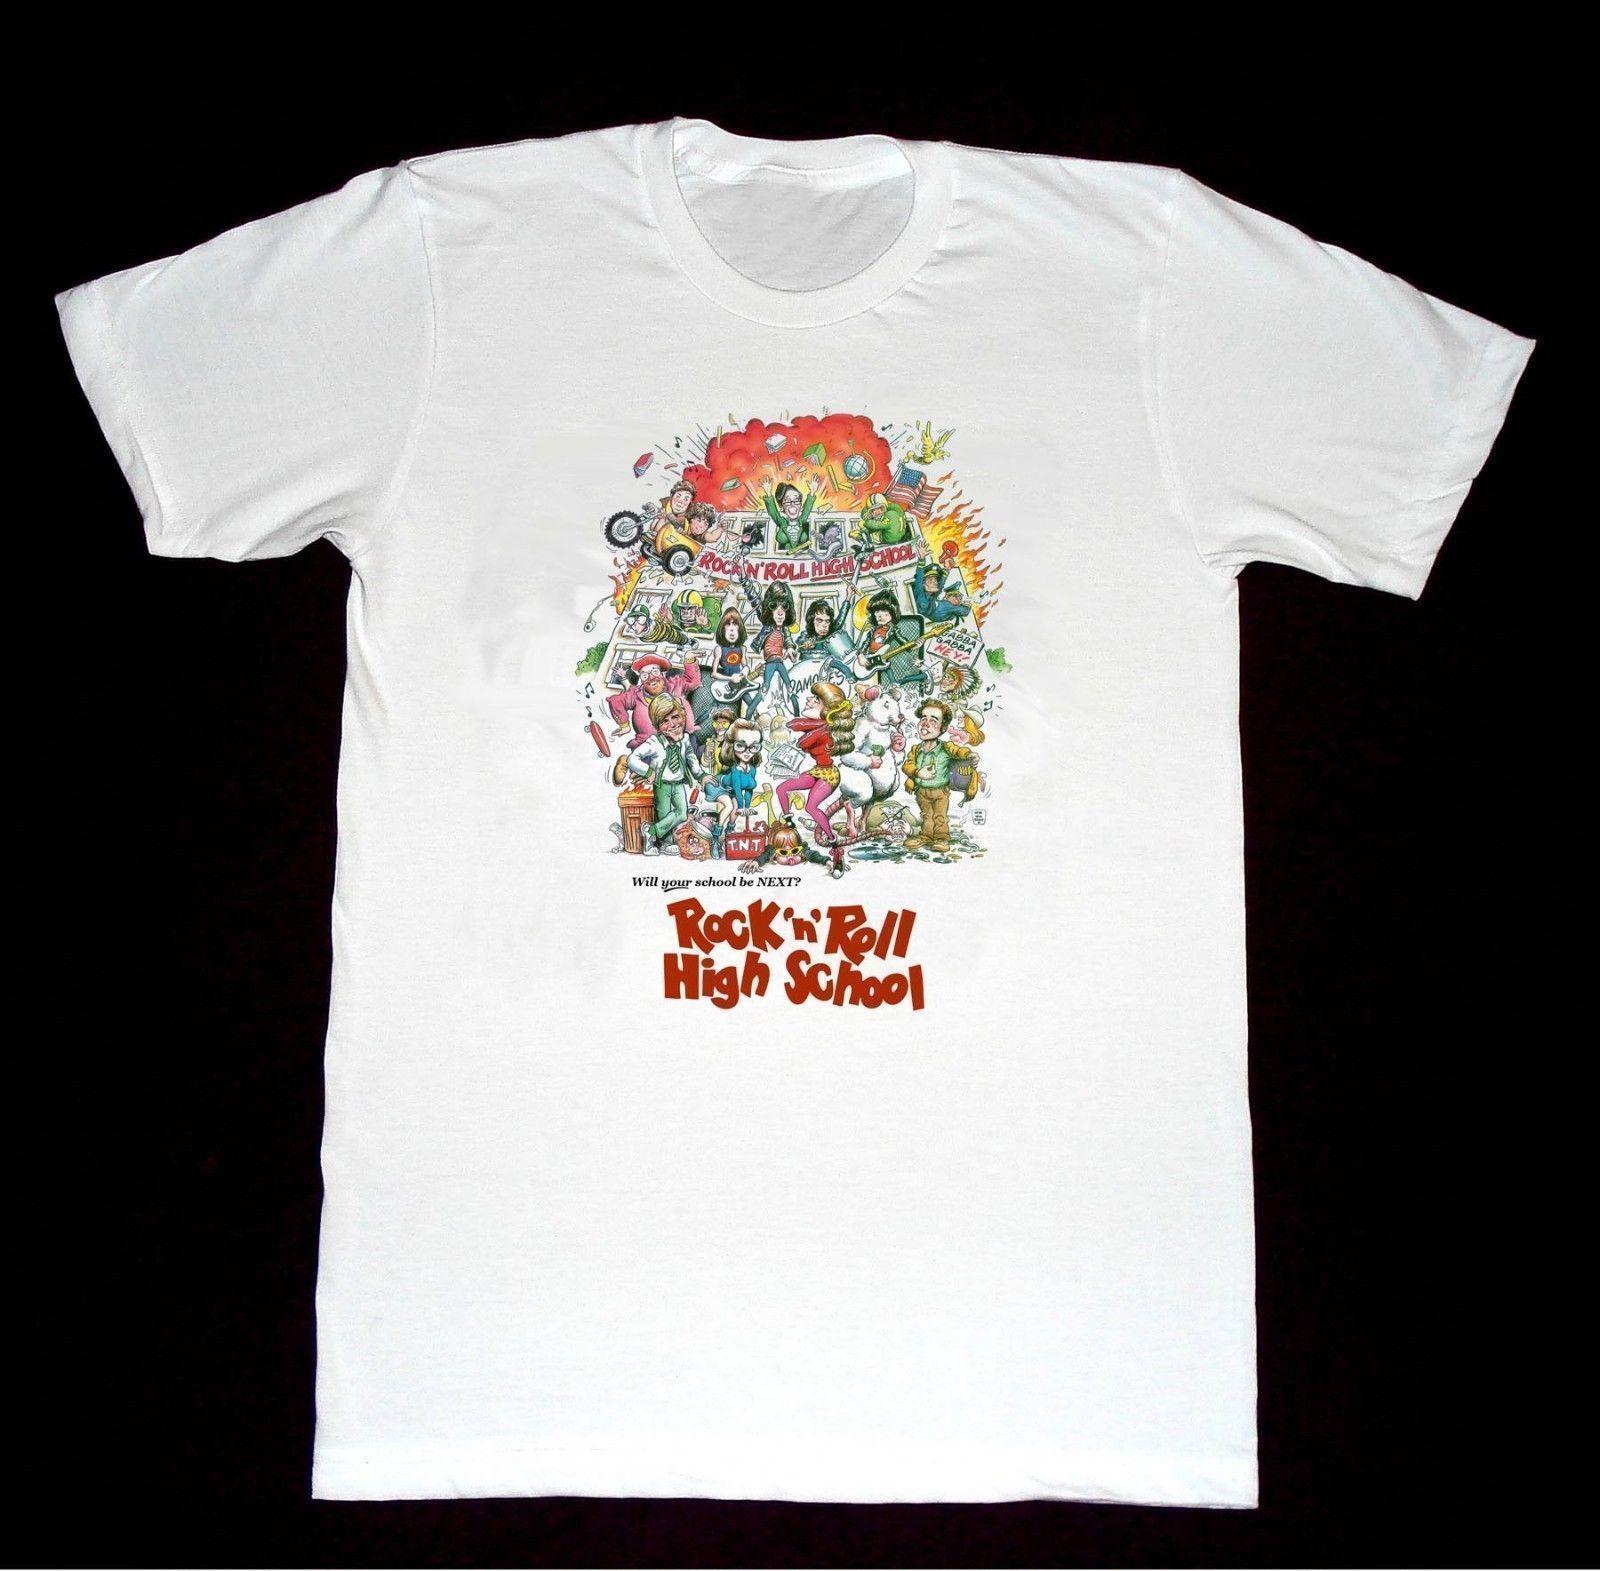 Rock Roll High School Ramones Tshirt Funny Printed Shirts Cool Tee